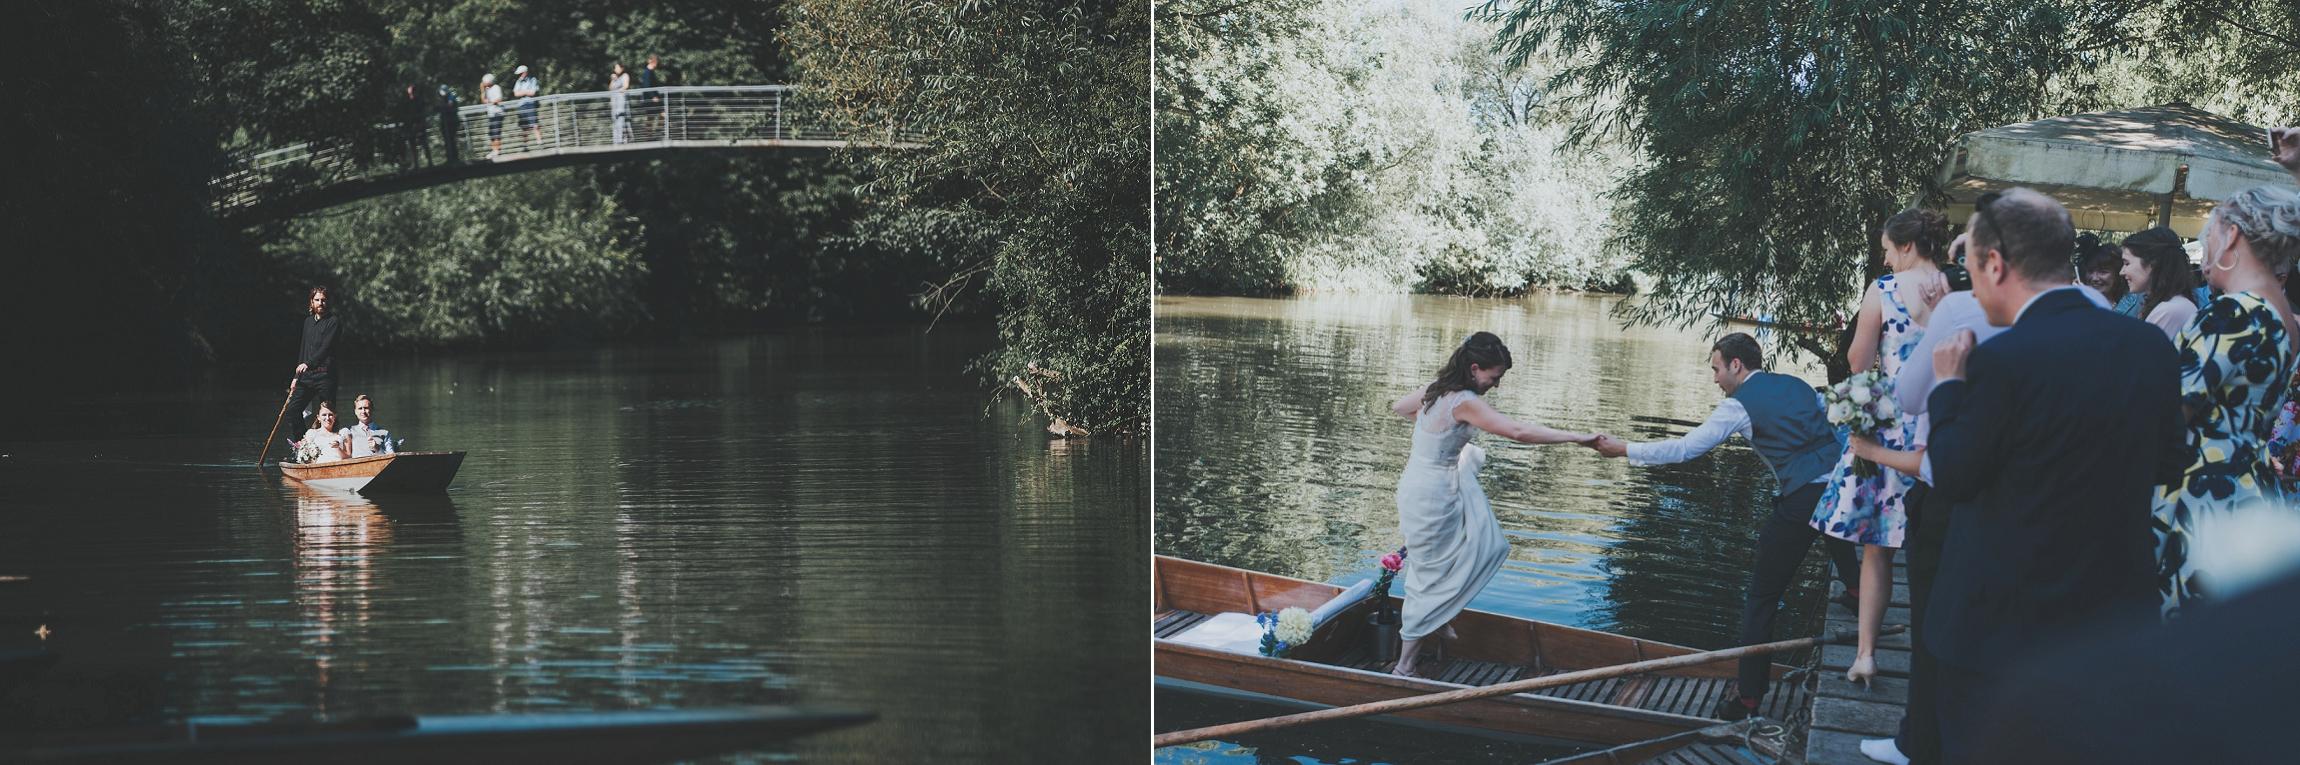 Oxford-Wedding-Photographer_0021.jpg